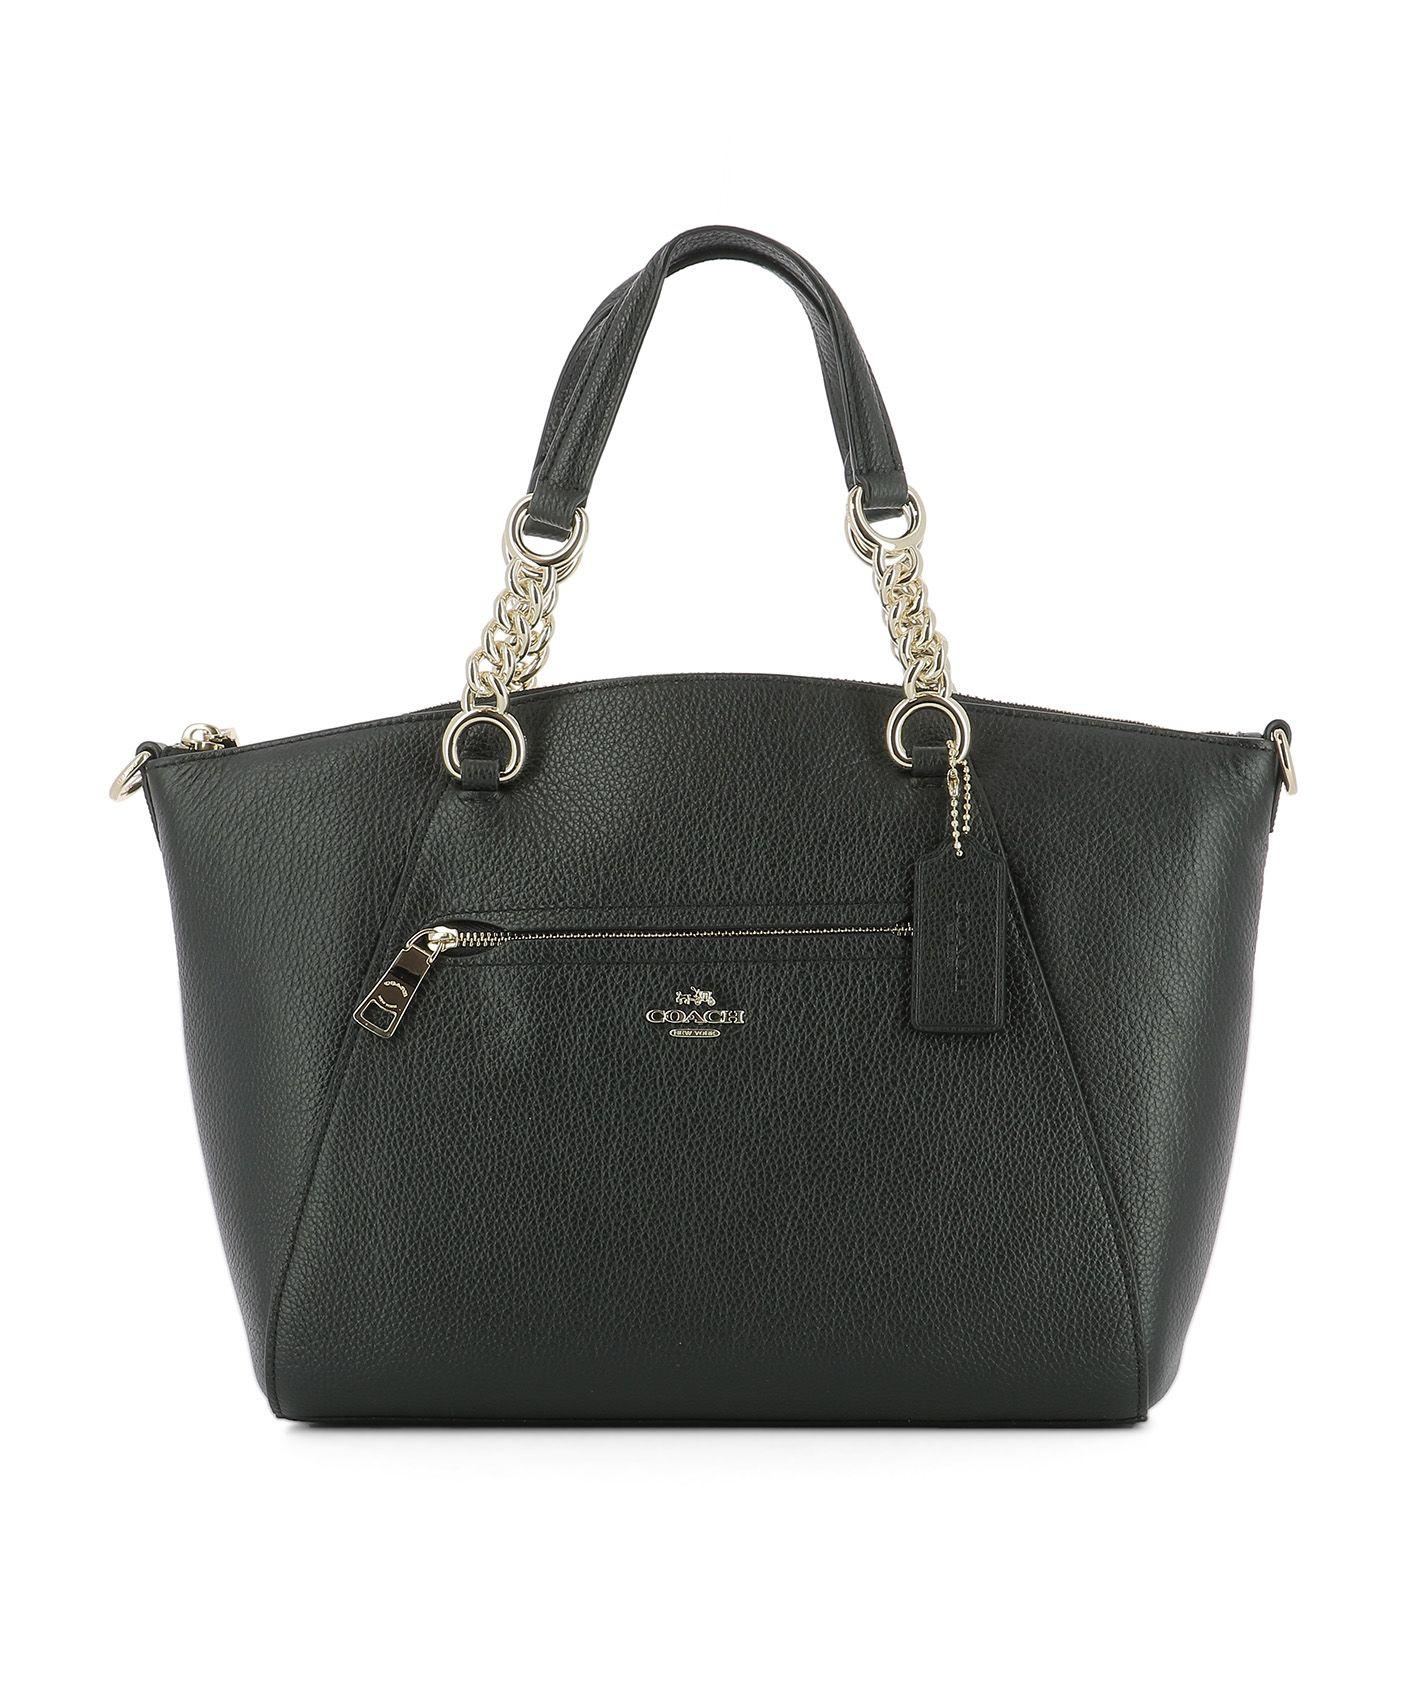 Black Leather Handle Bag